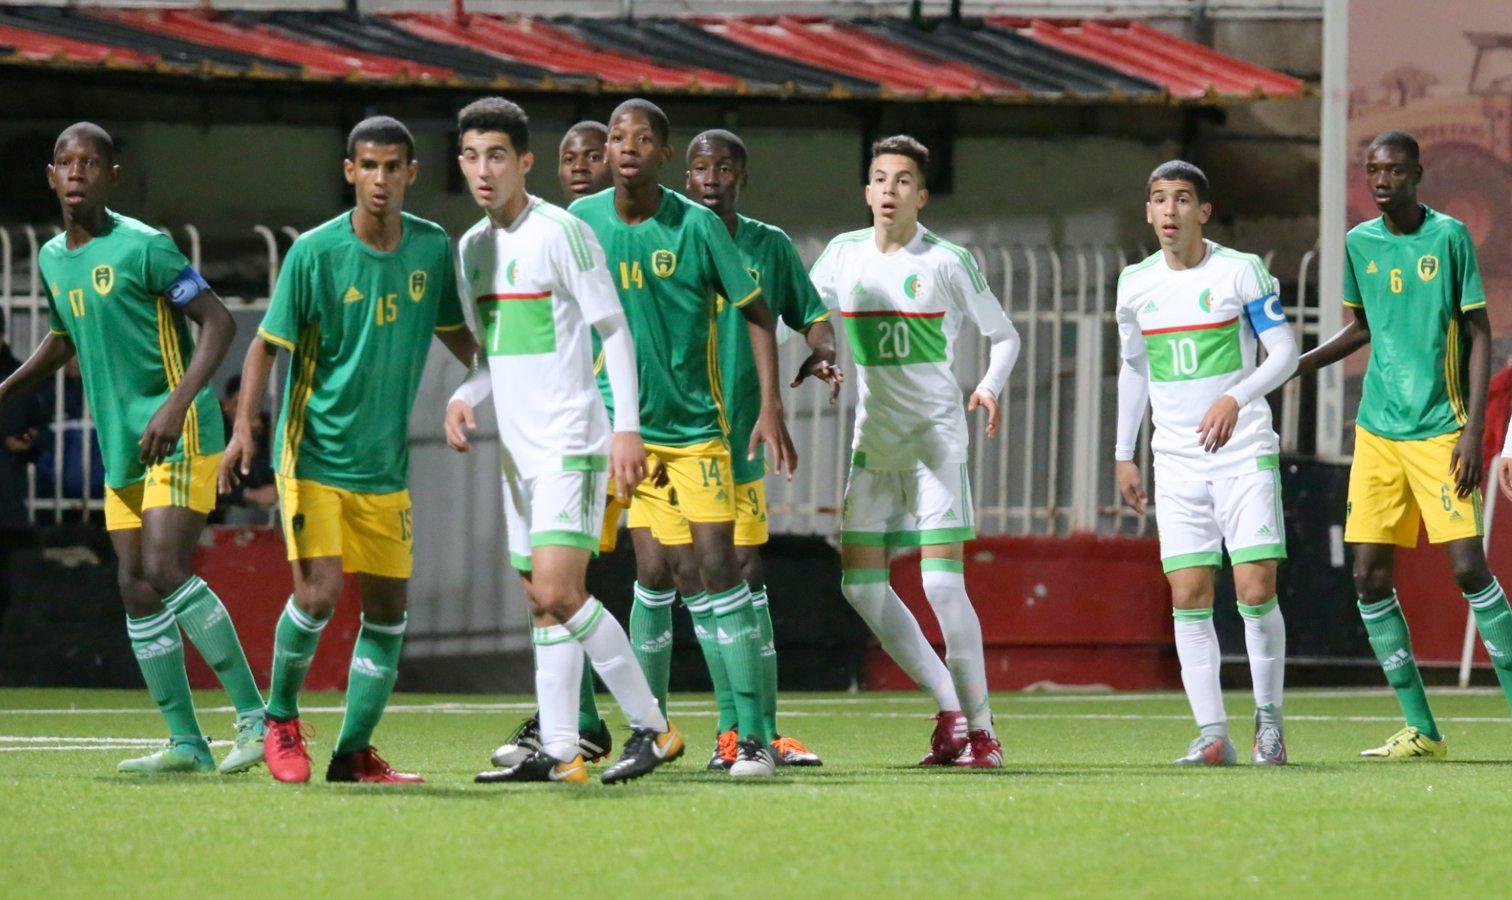 U17 mauritanie action